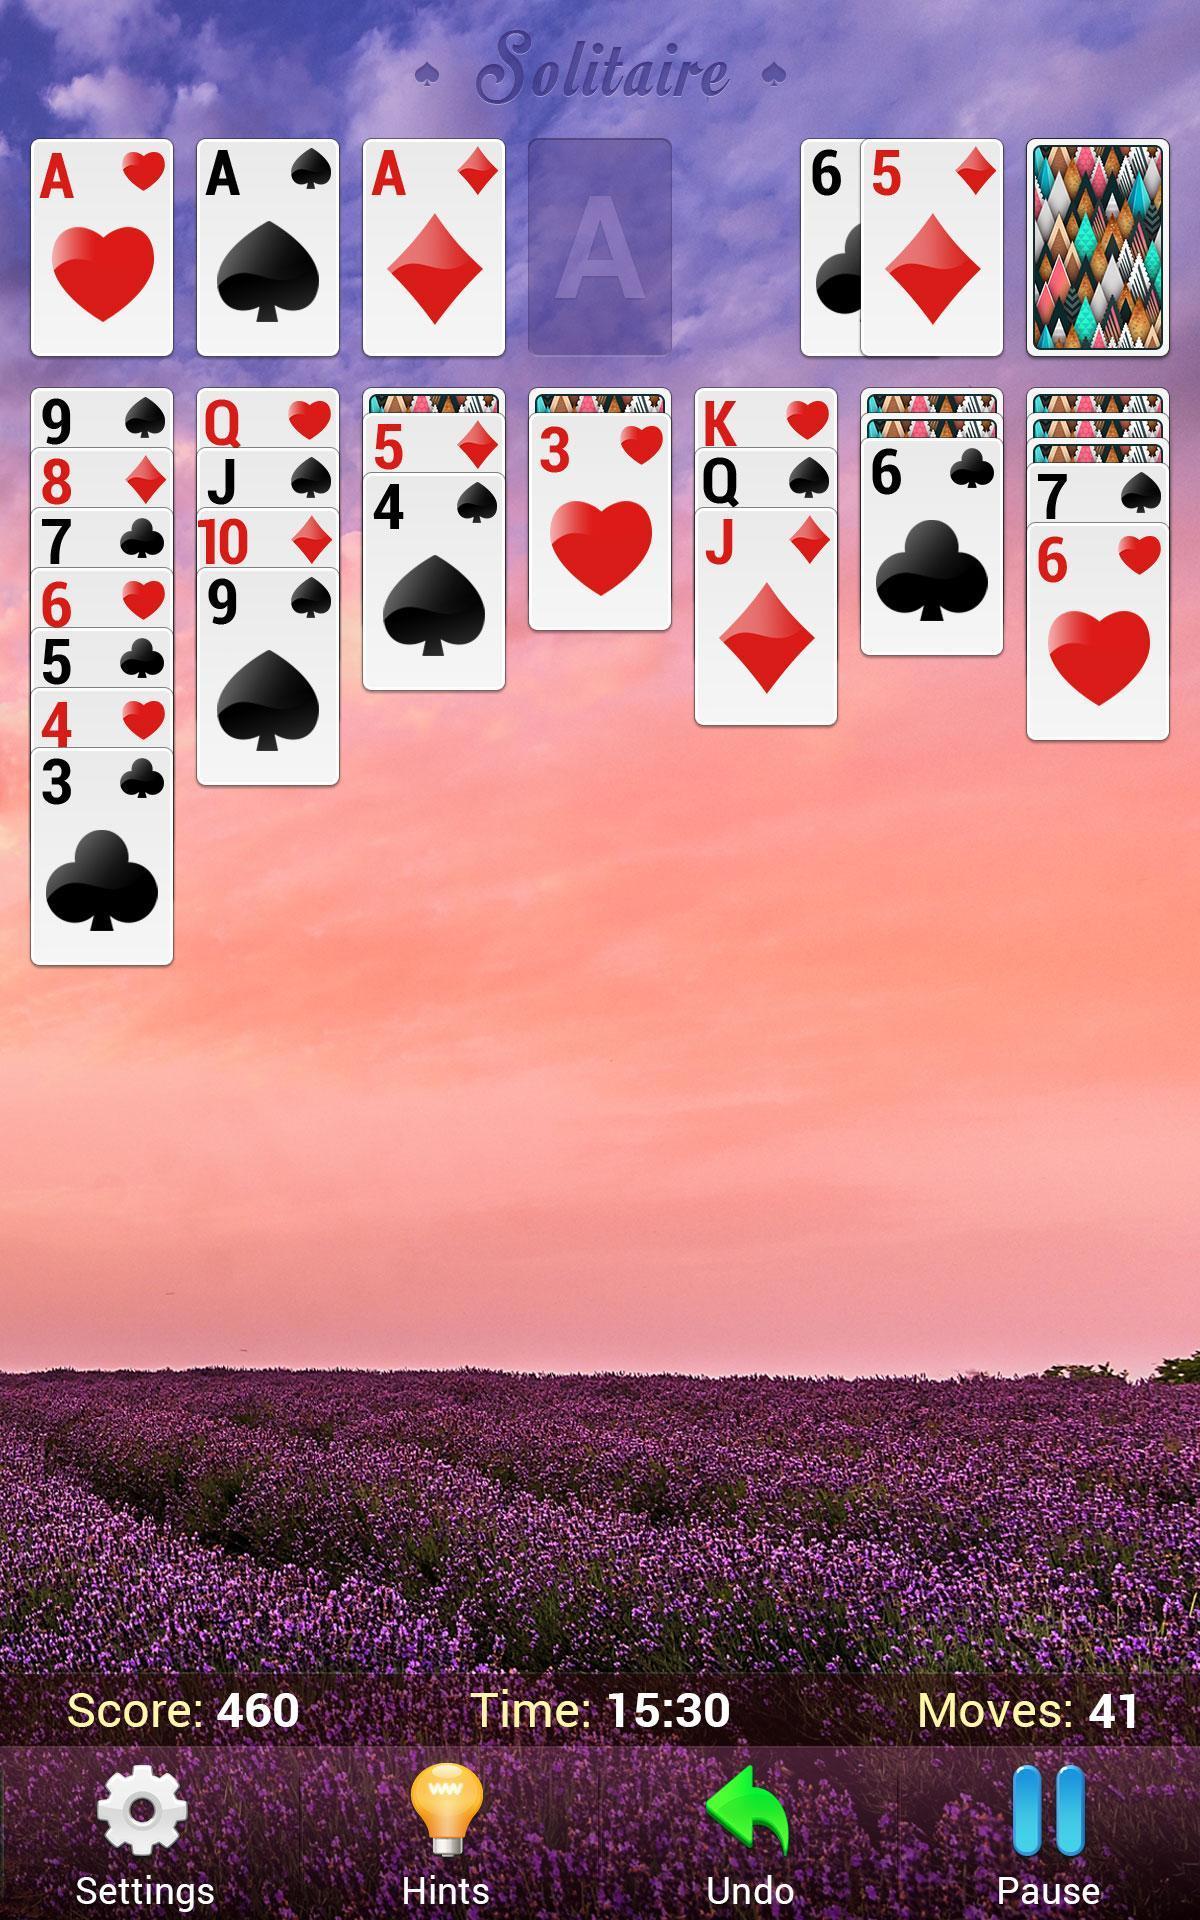 Solitaire Classic Klondike Solitaire Card Game 1.0.27 Screenshot 14